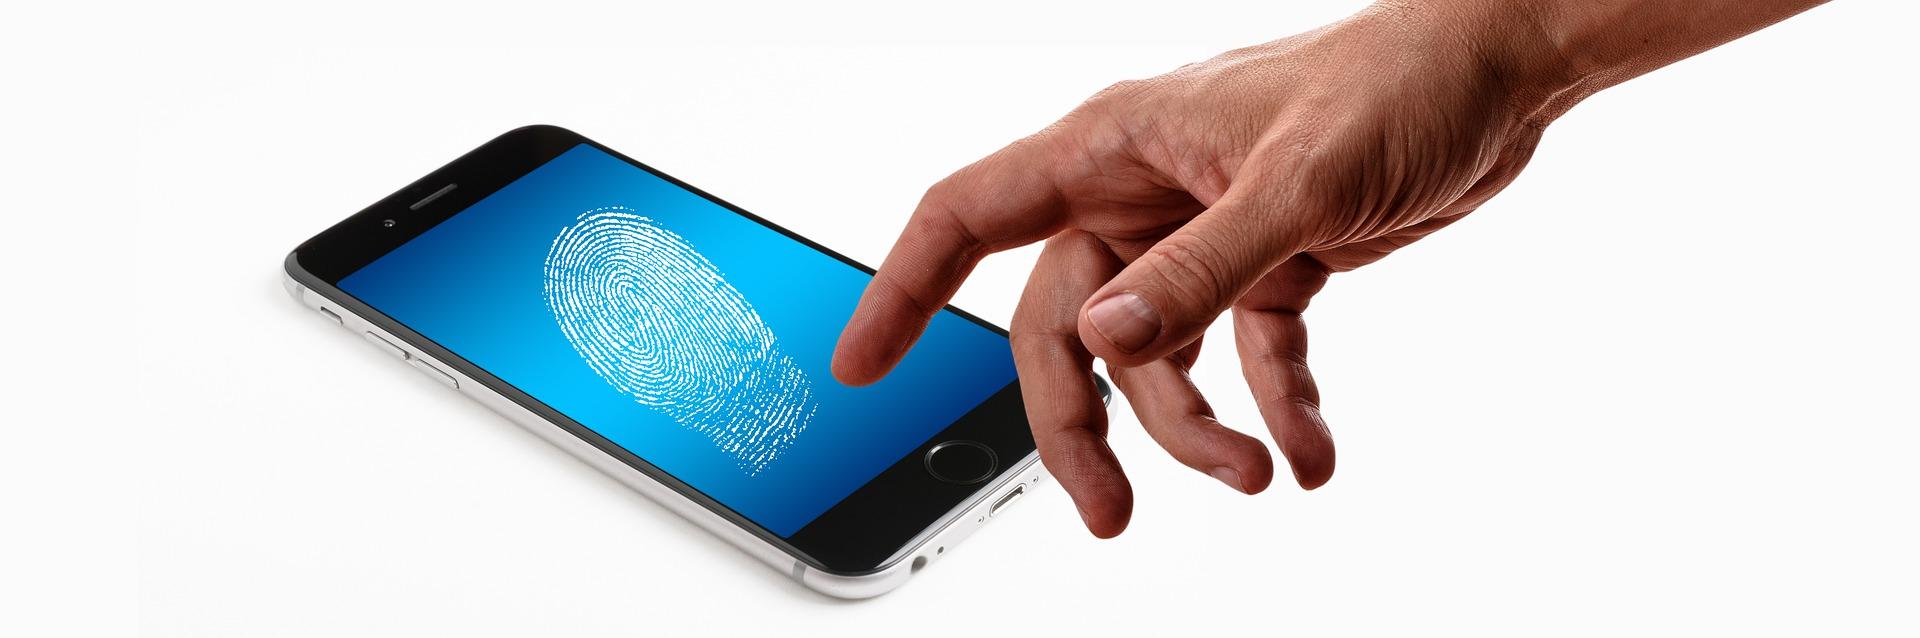 smartphone-4562985_1920-1.jpg